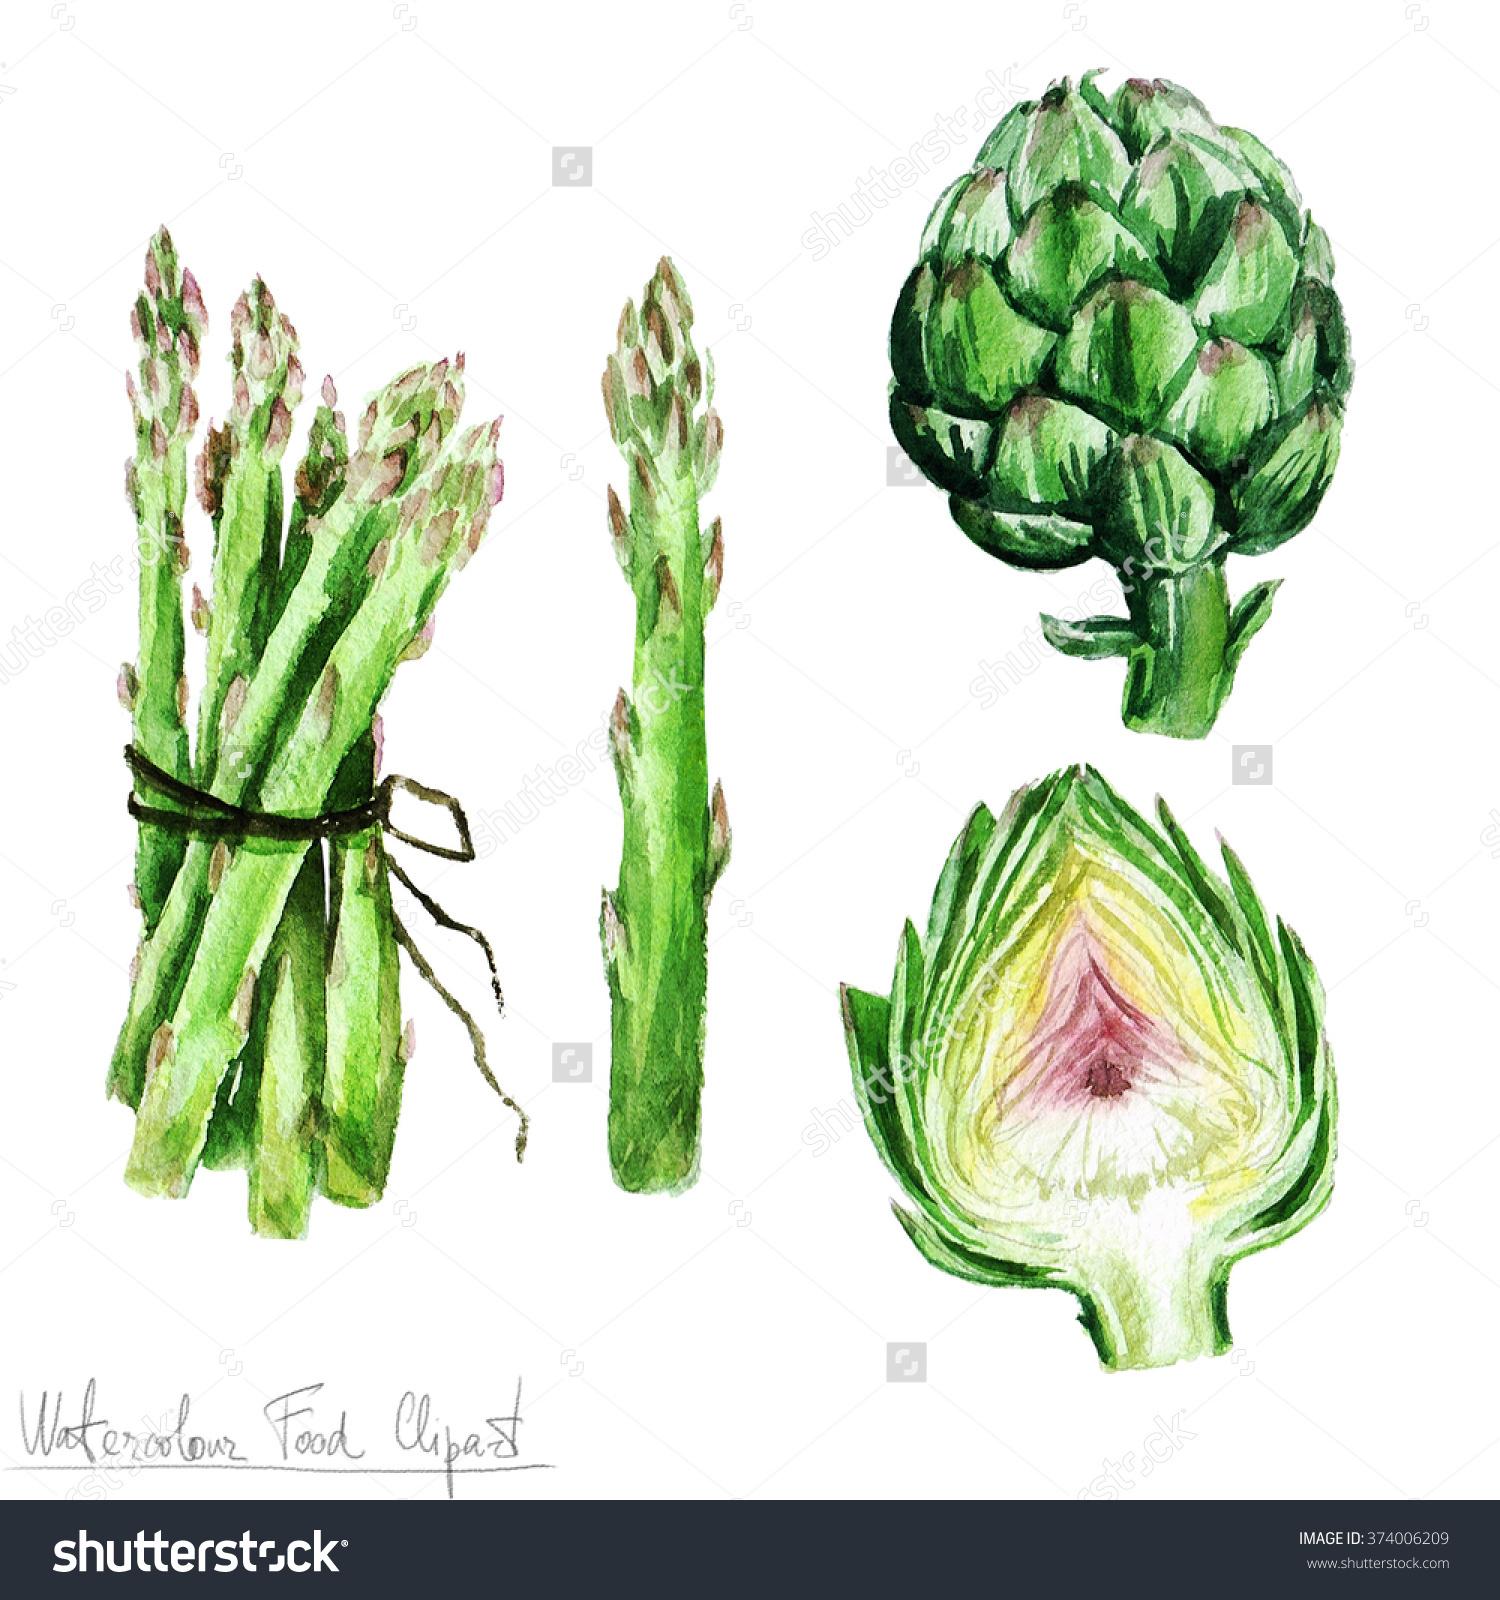 Watercolor Food Clipart Asparagus Artichoke Stock Illustration.